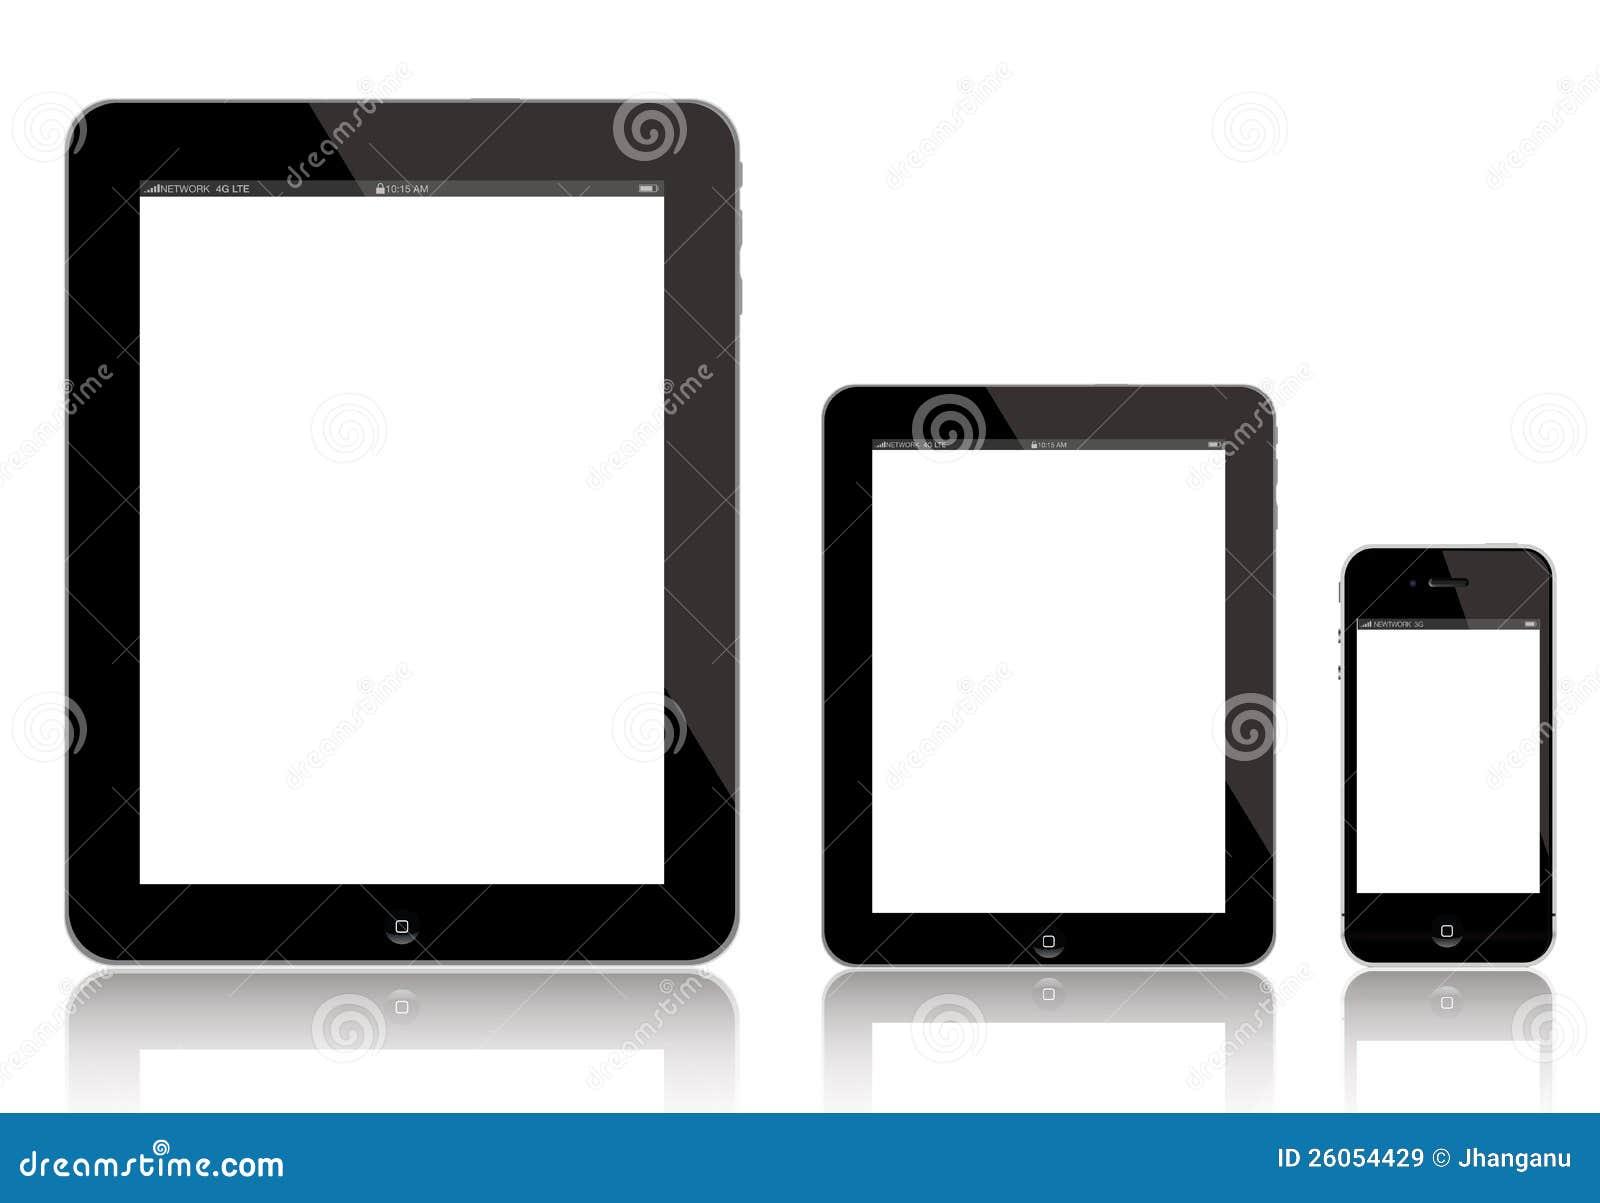 IPad 4, νέο iPad μίνι και iPhone